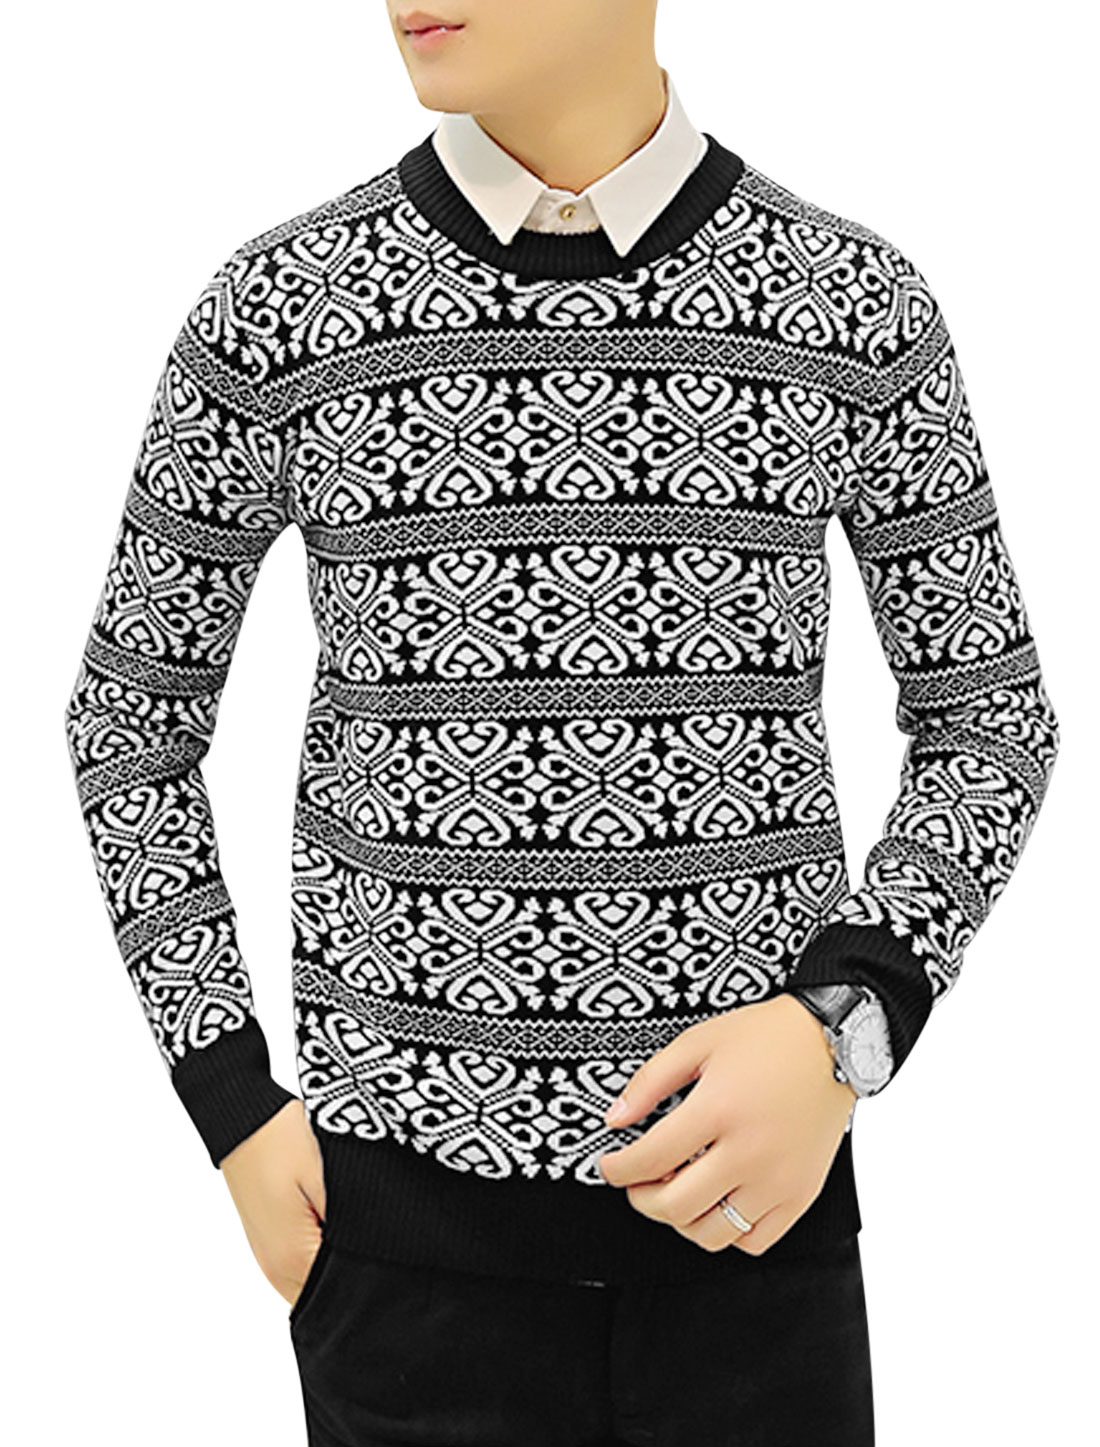 Men Jacquard Long Sleeves Slim Fit Black White Knit Shirt S